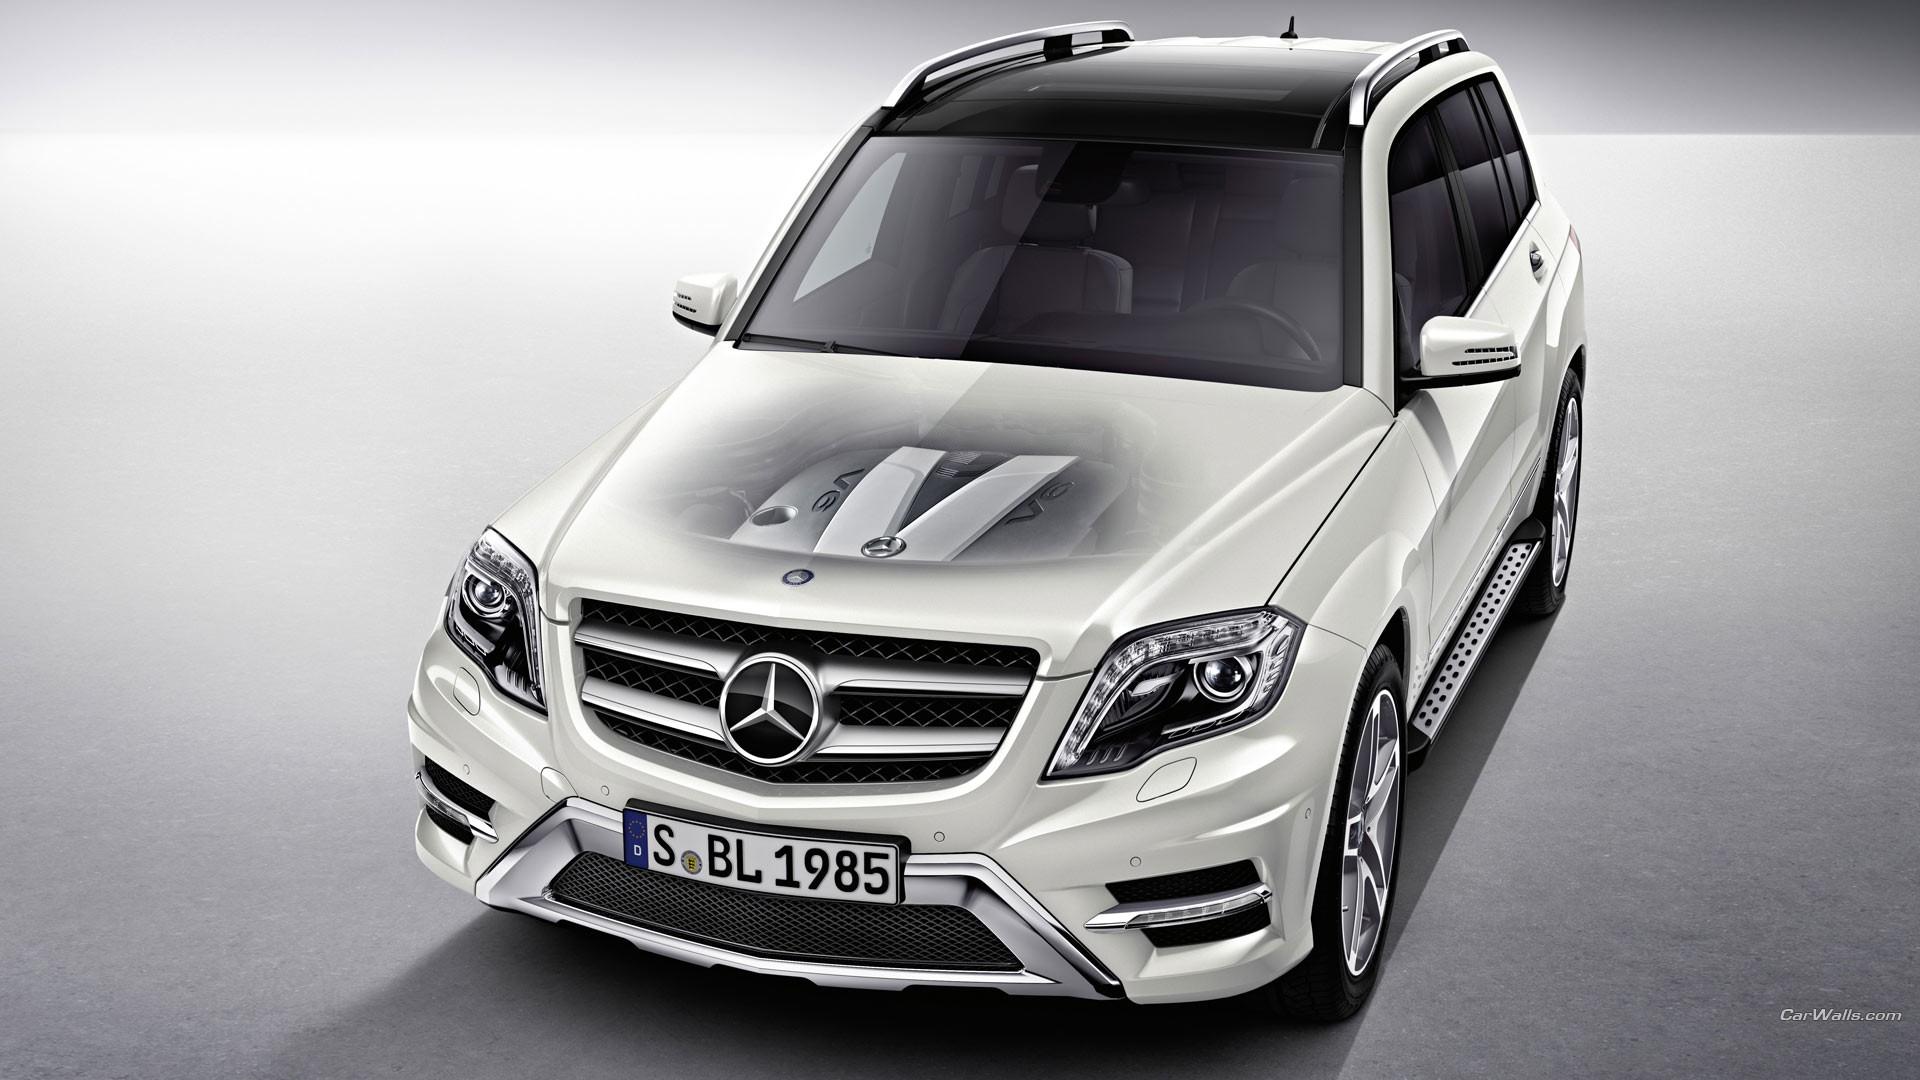 mercedes glk car vehicle mercedes-benz silver cars numbers